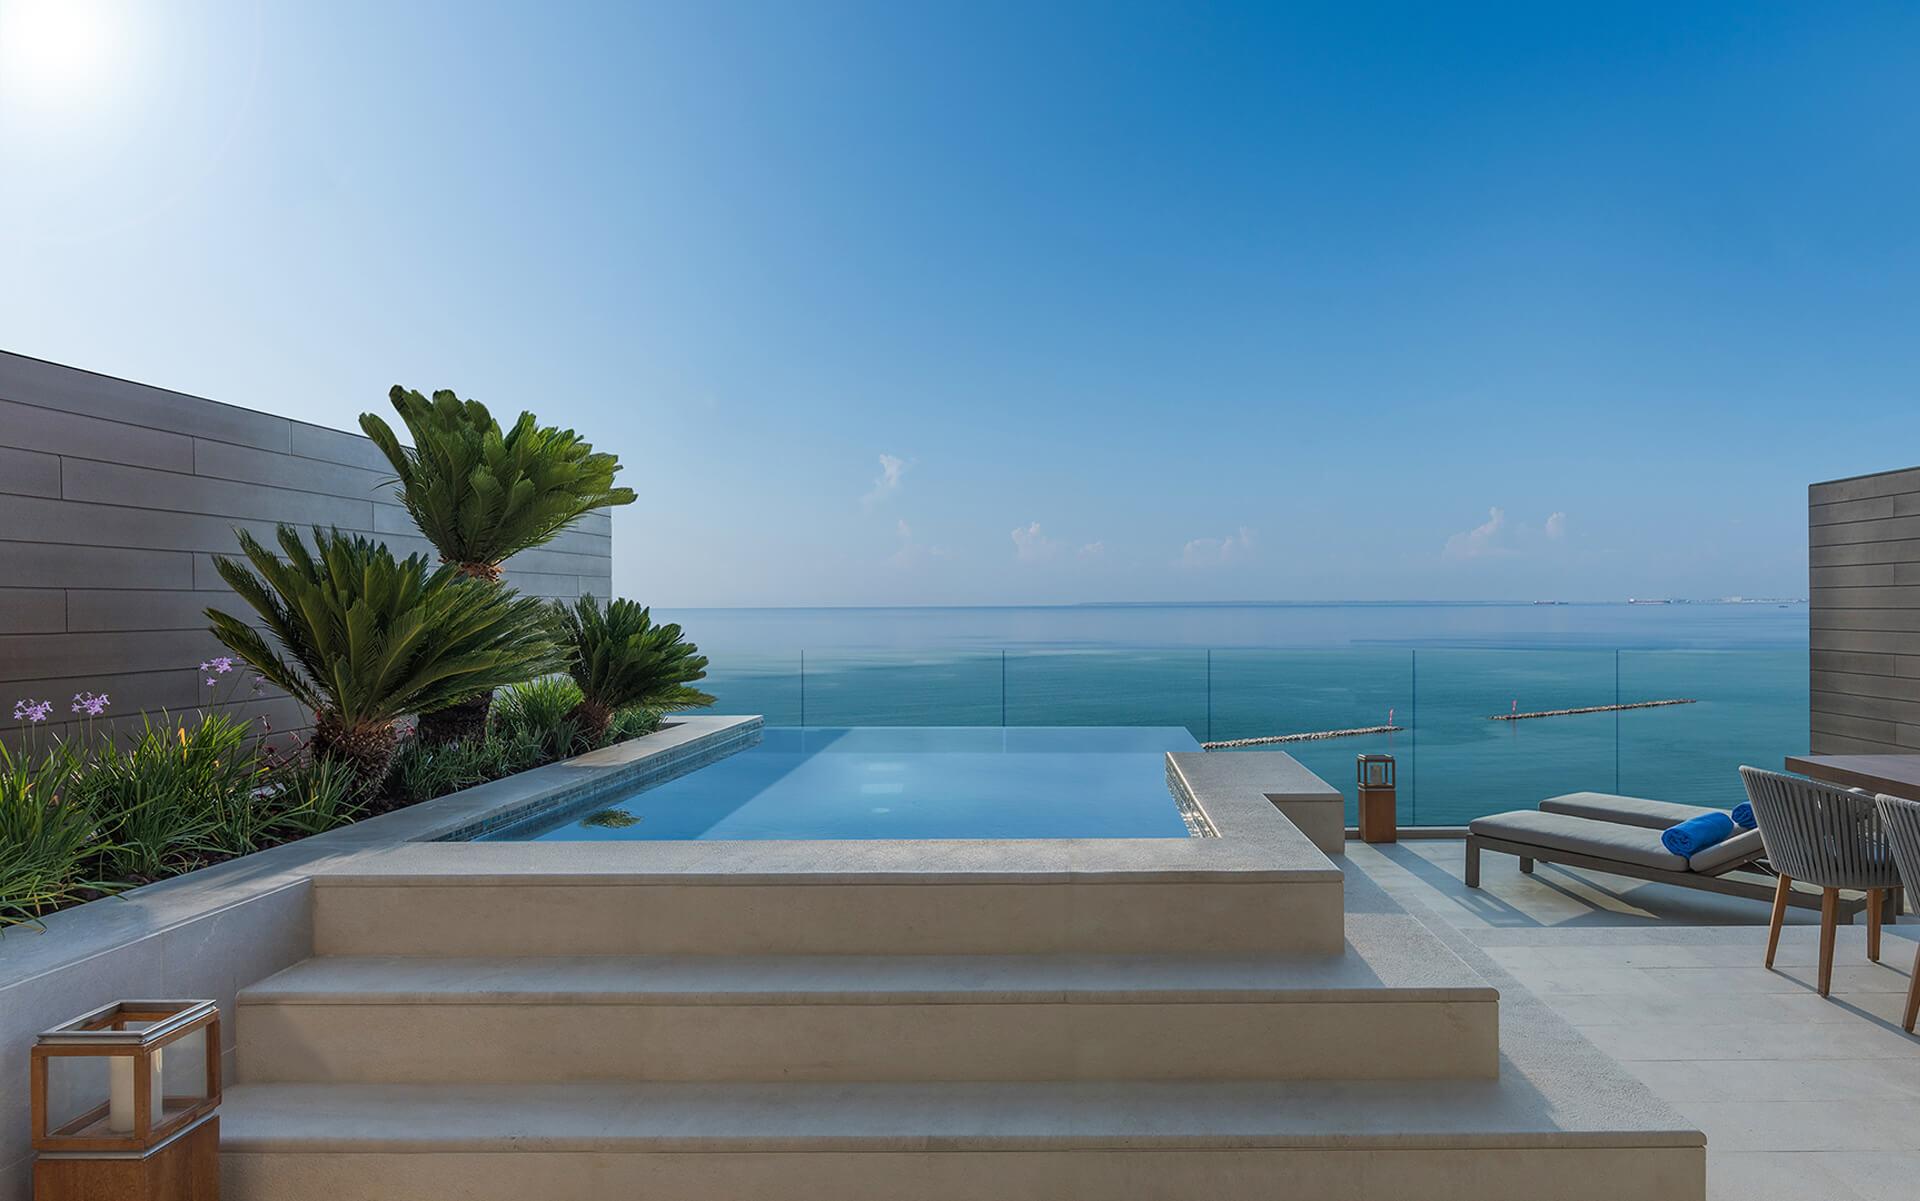 Amara: Five Star Luxury Hotel in Limassol, Cyprus | Ultimate Luxury